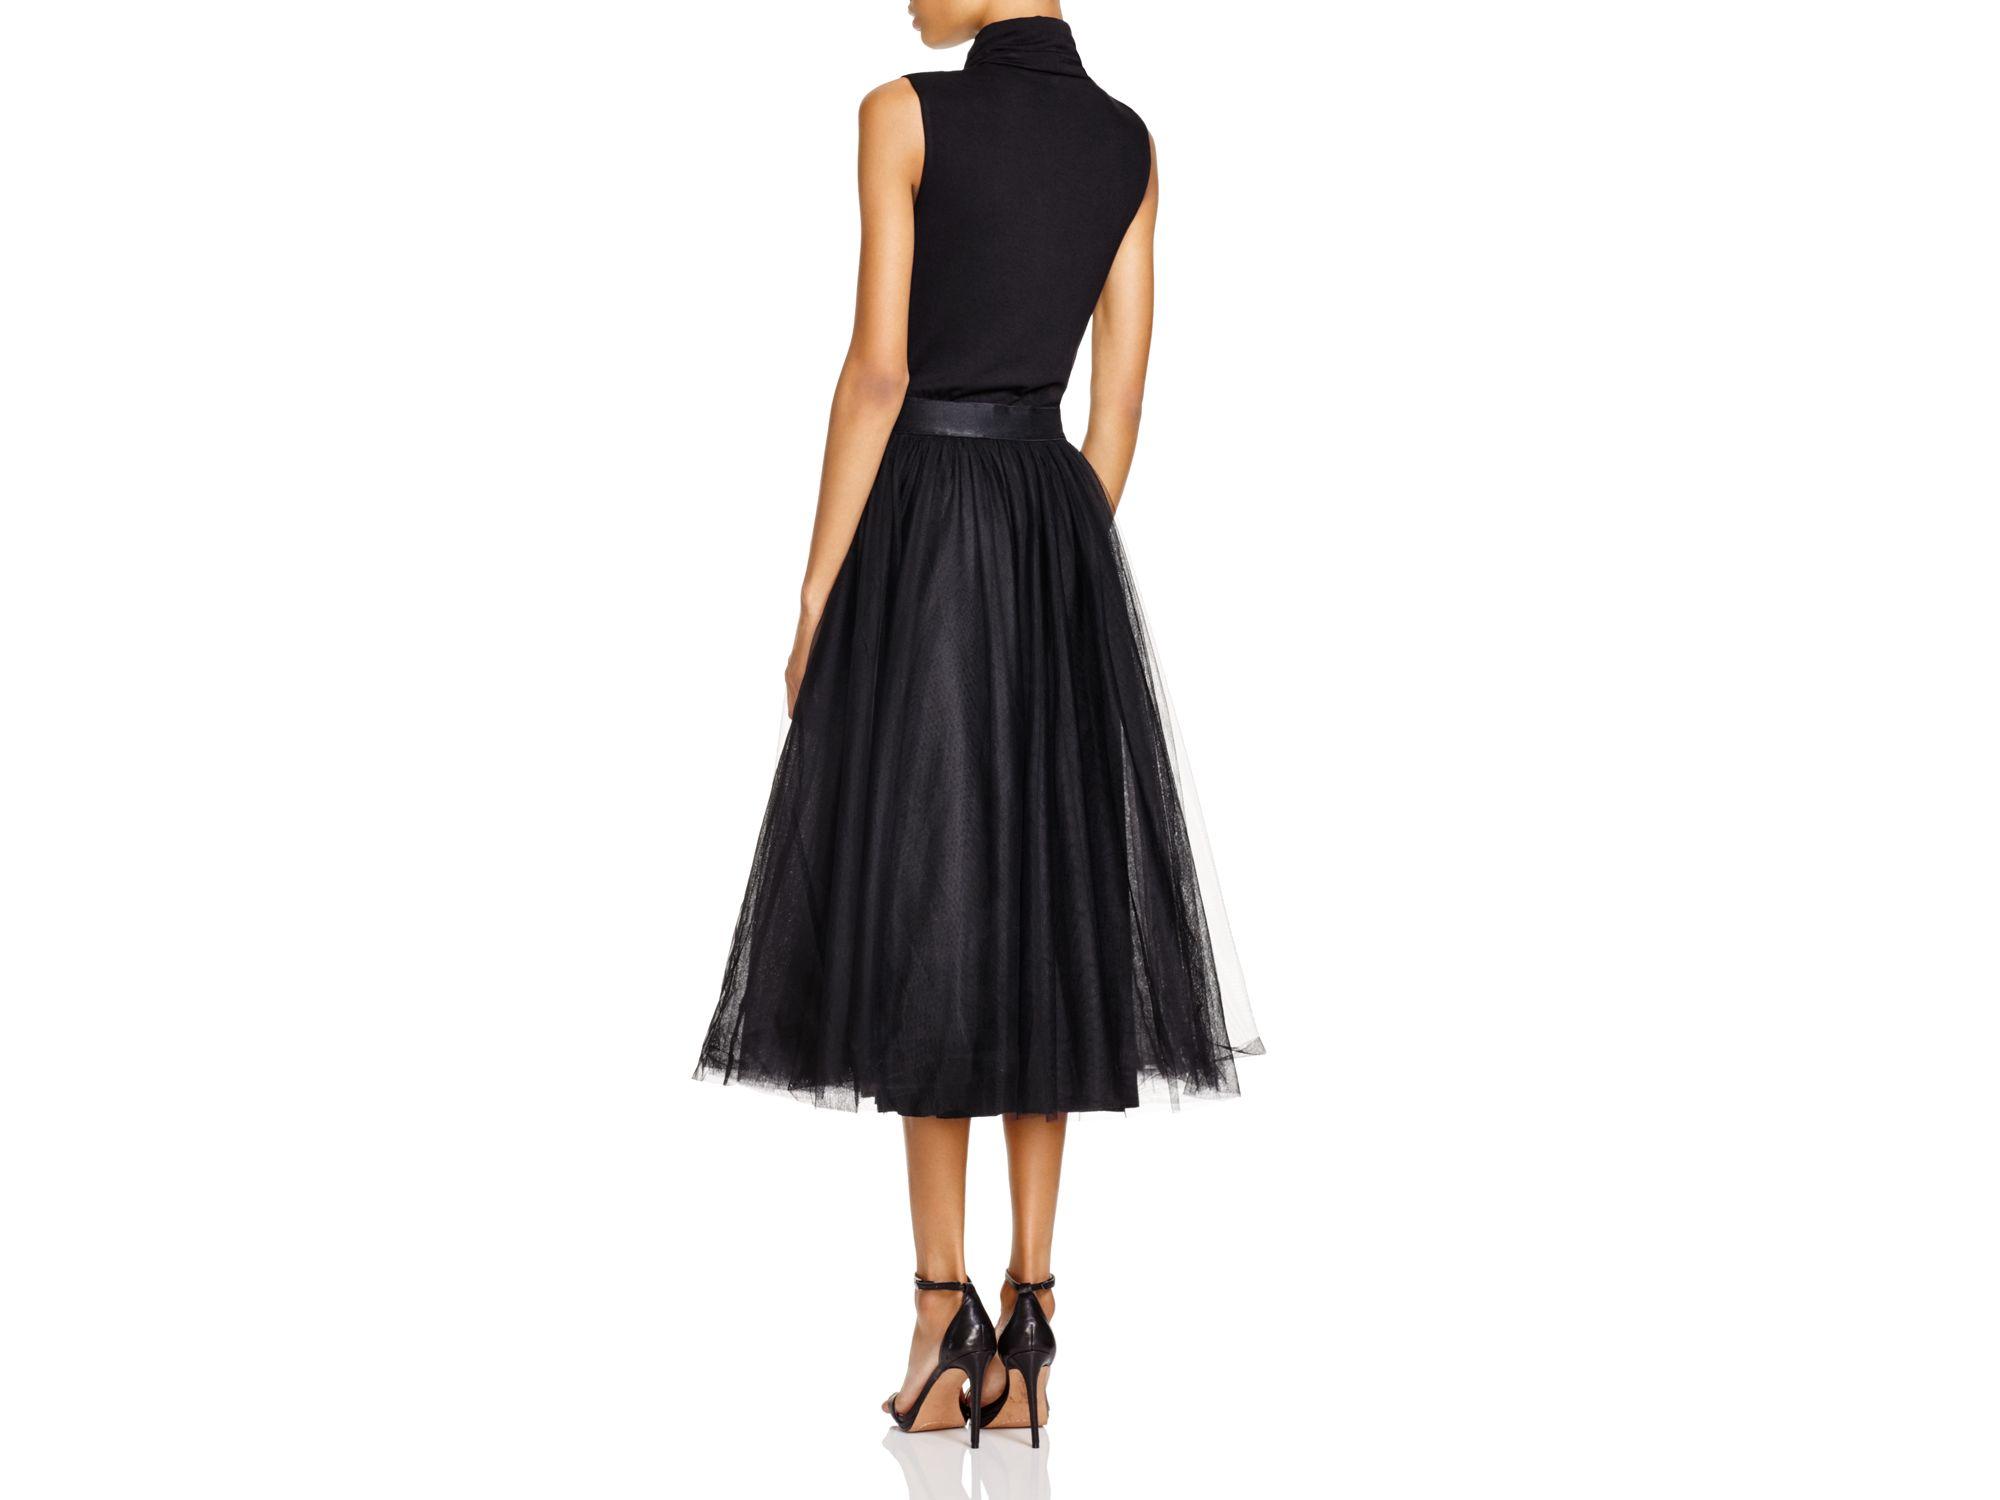 322deae8aea1a Lyst - Bailey 44 Turtleneck Tulle Skirt Midi Dress in Black